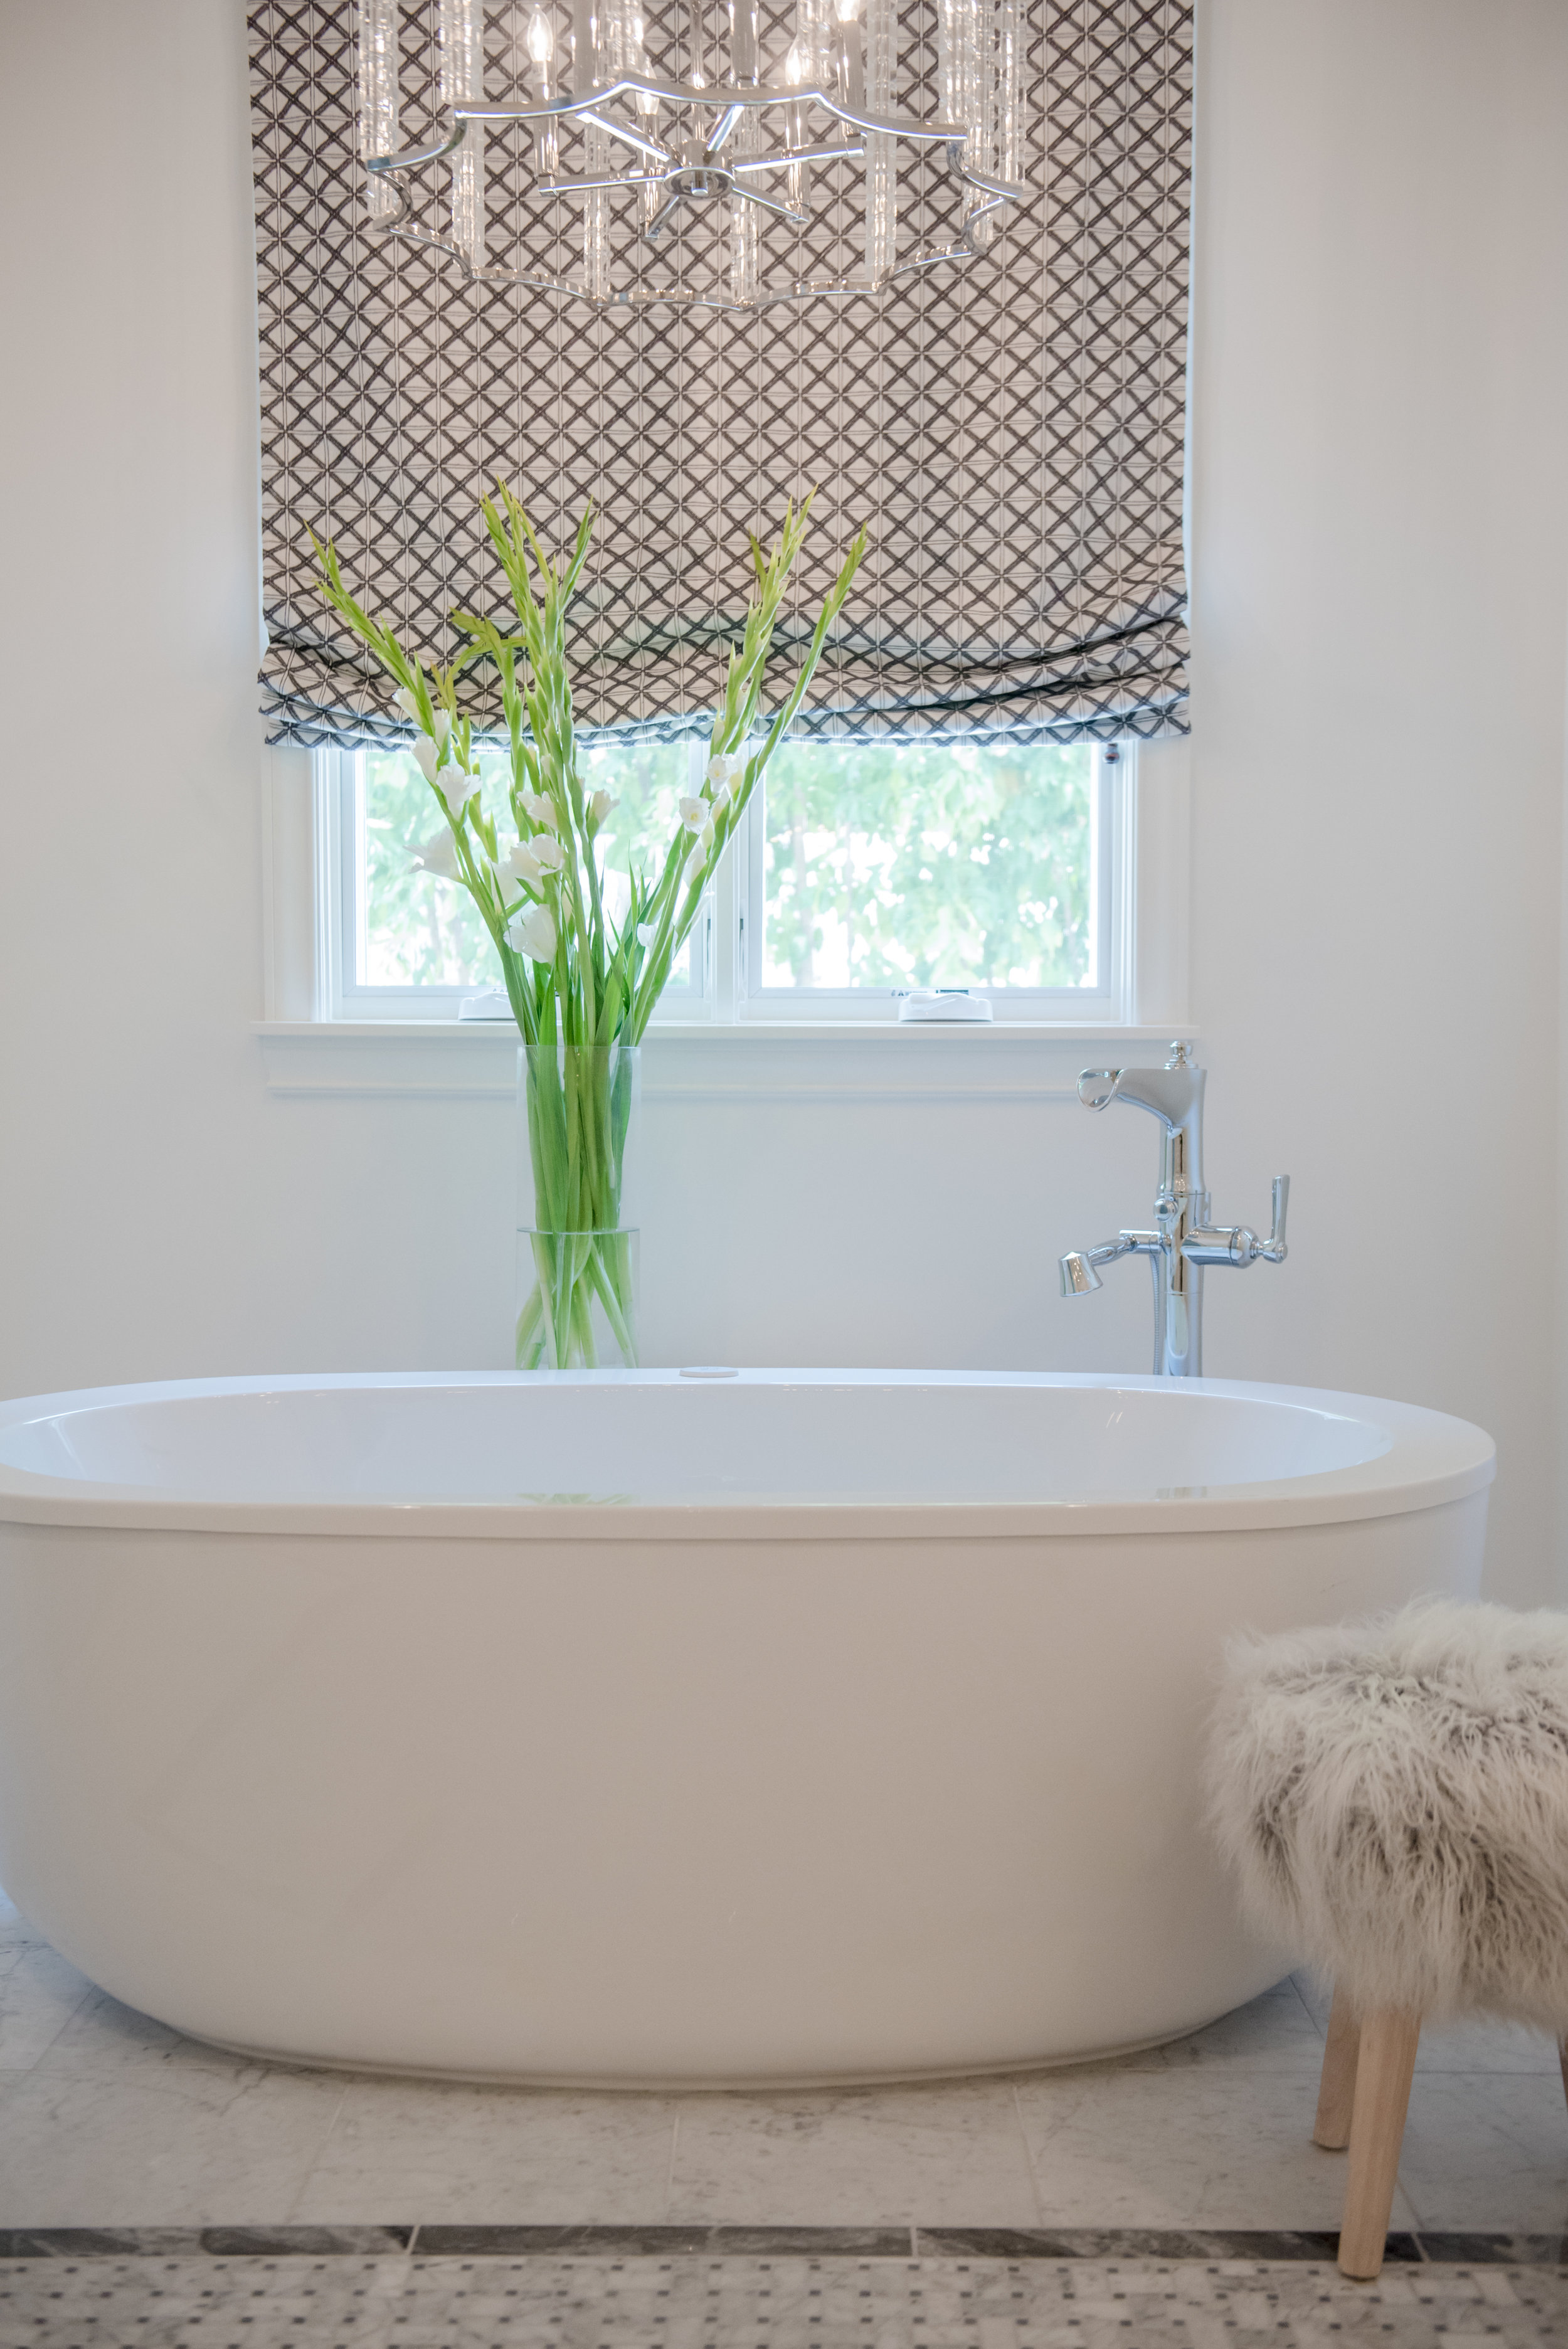 73+Master+Bath+Carrara+Marble+Vanity+Bathtub+Romanshades+Floral+Sheepskin+Window+Scottsdale.jpg